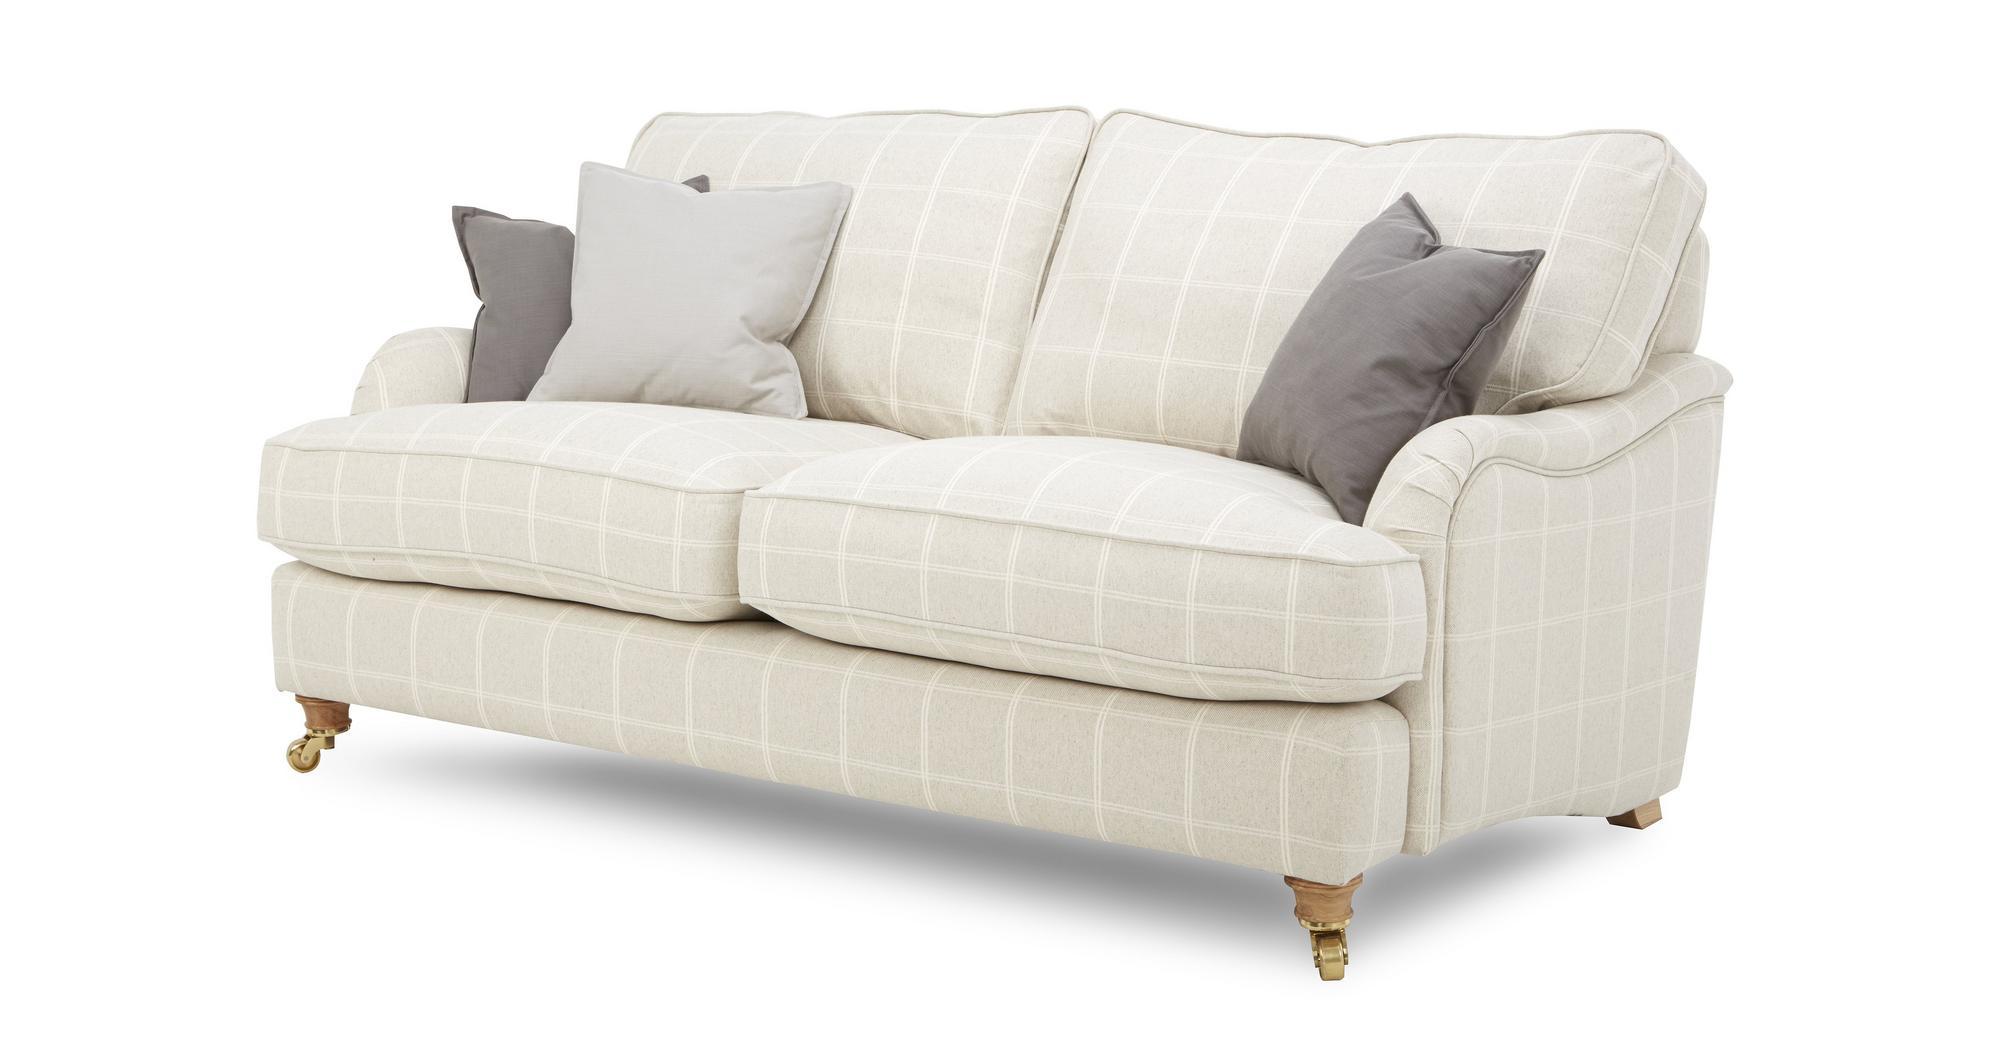 Dfs gower natural fabric set large sofa medium sofa for Sofa natura 6650